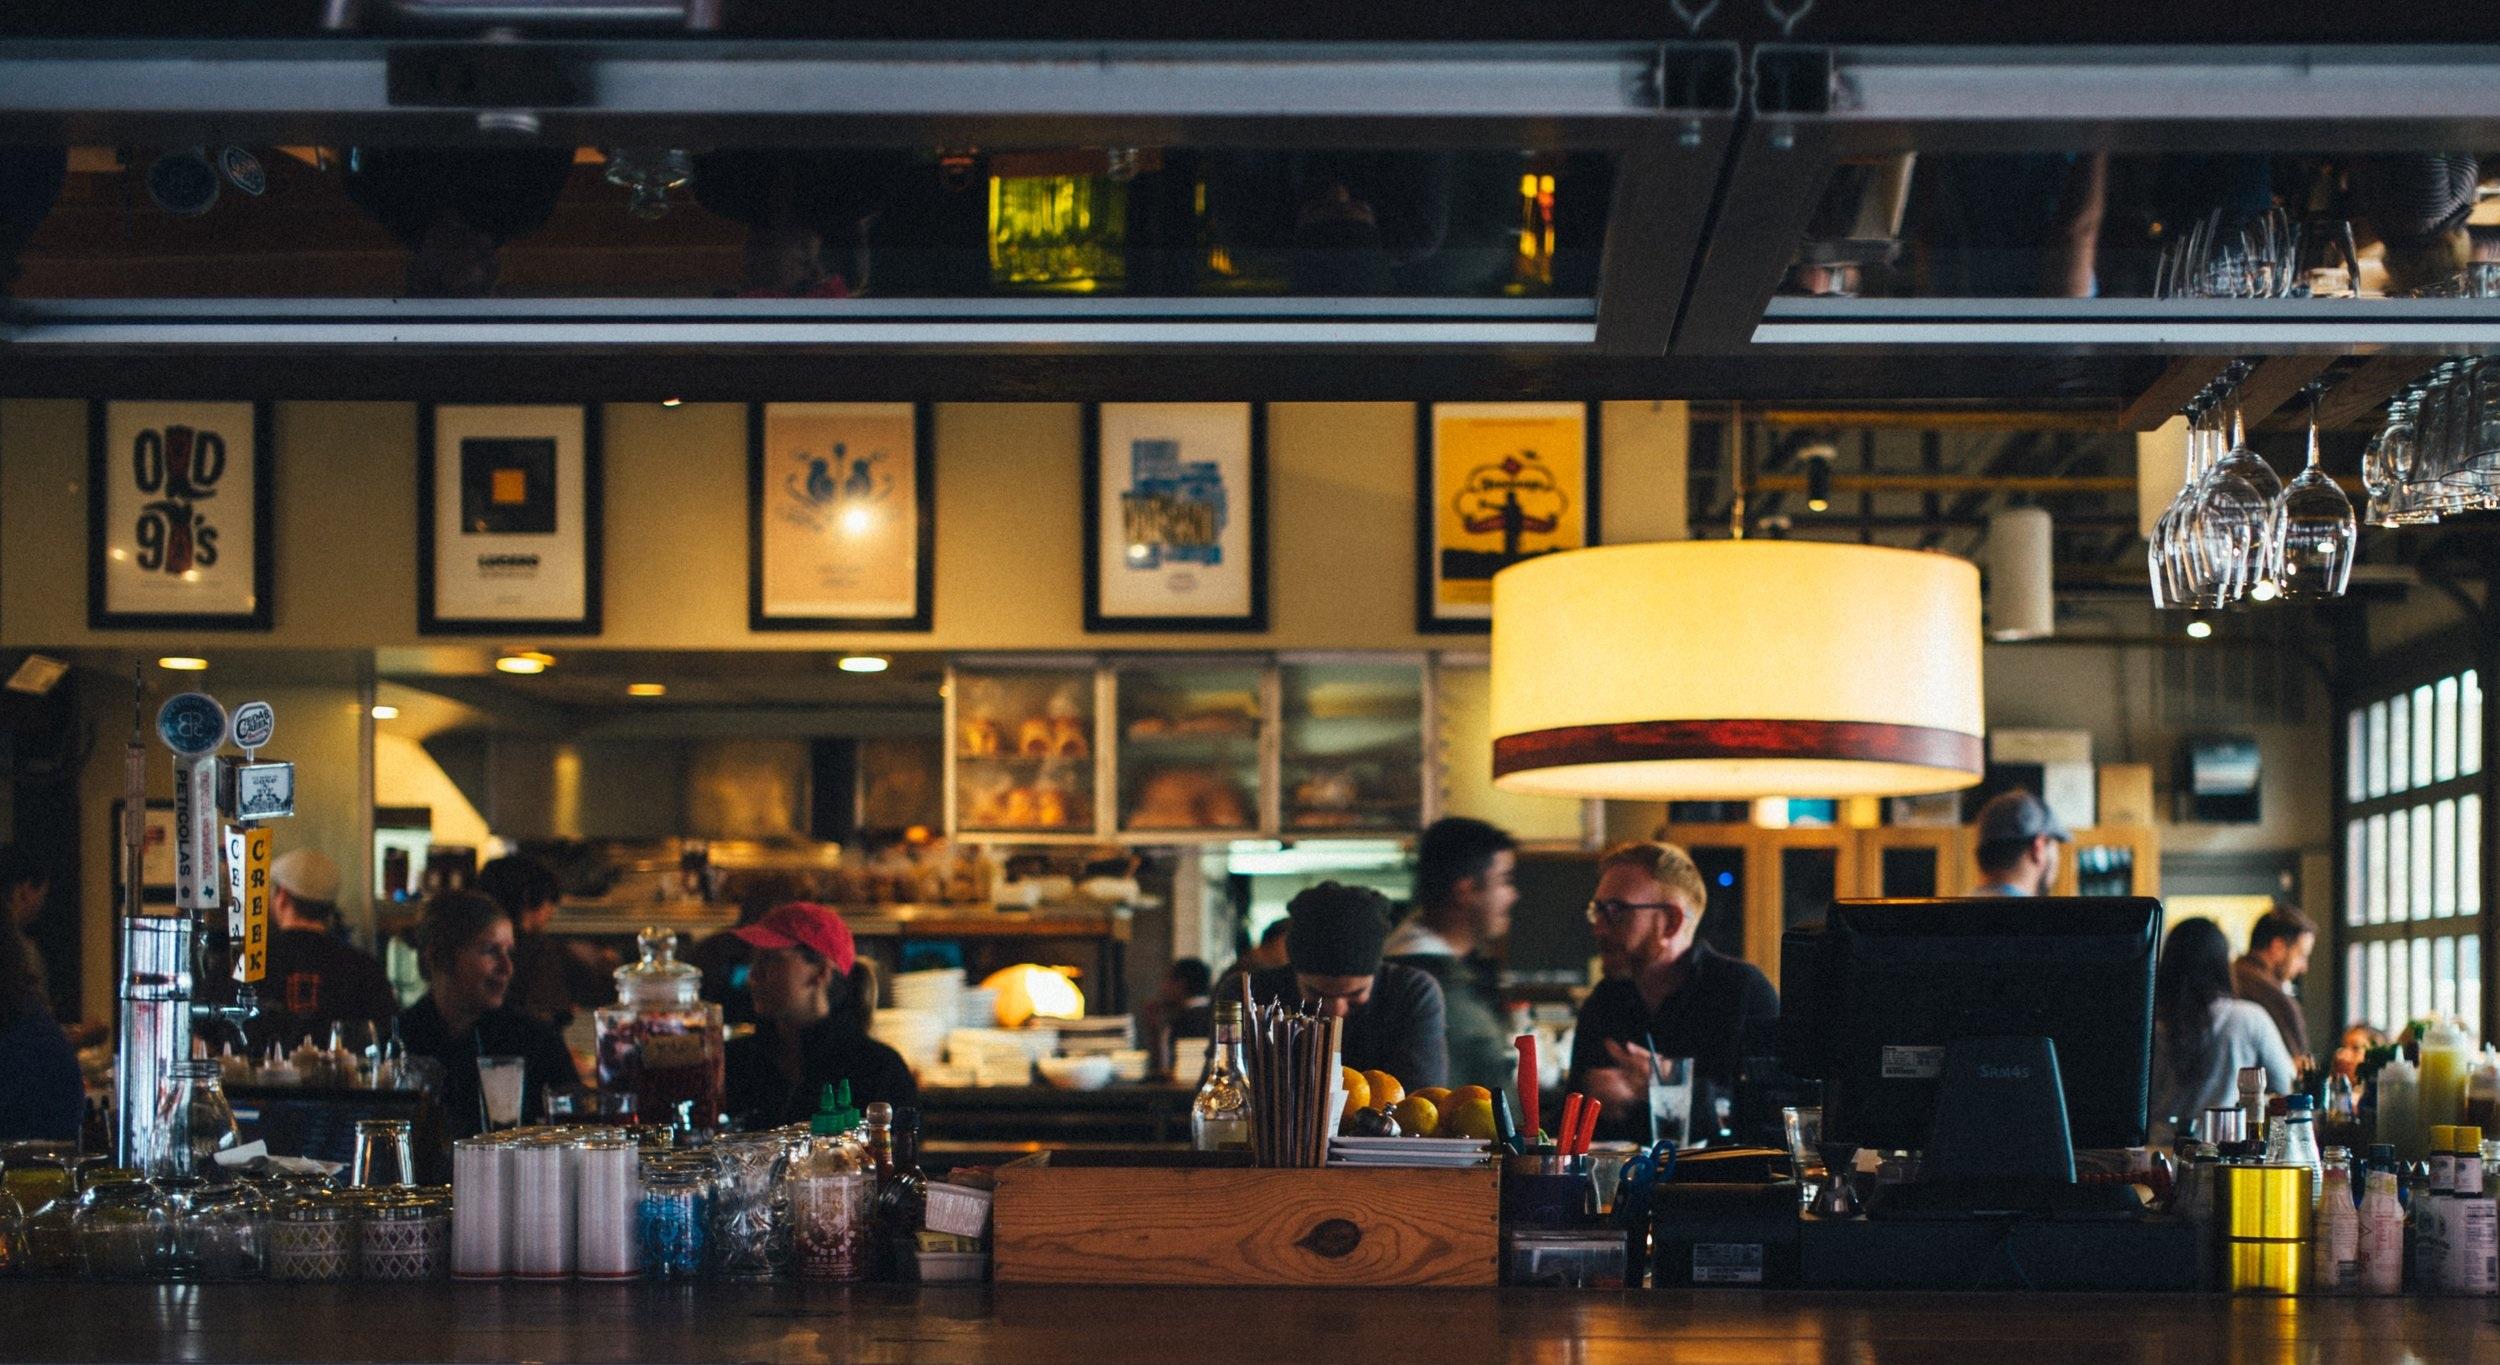 restaurant+serge-esteve-5821-unsplash.jpg